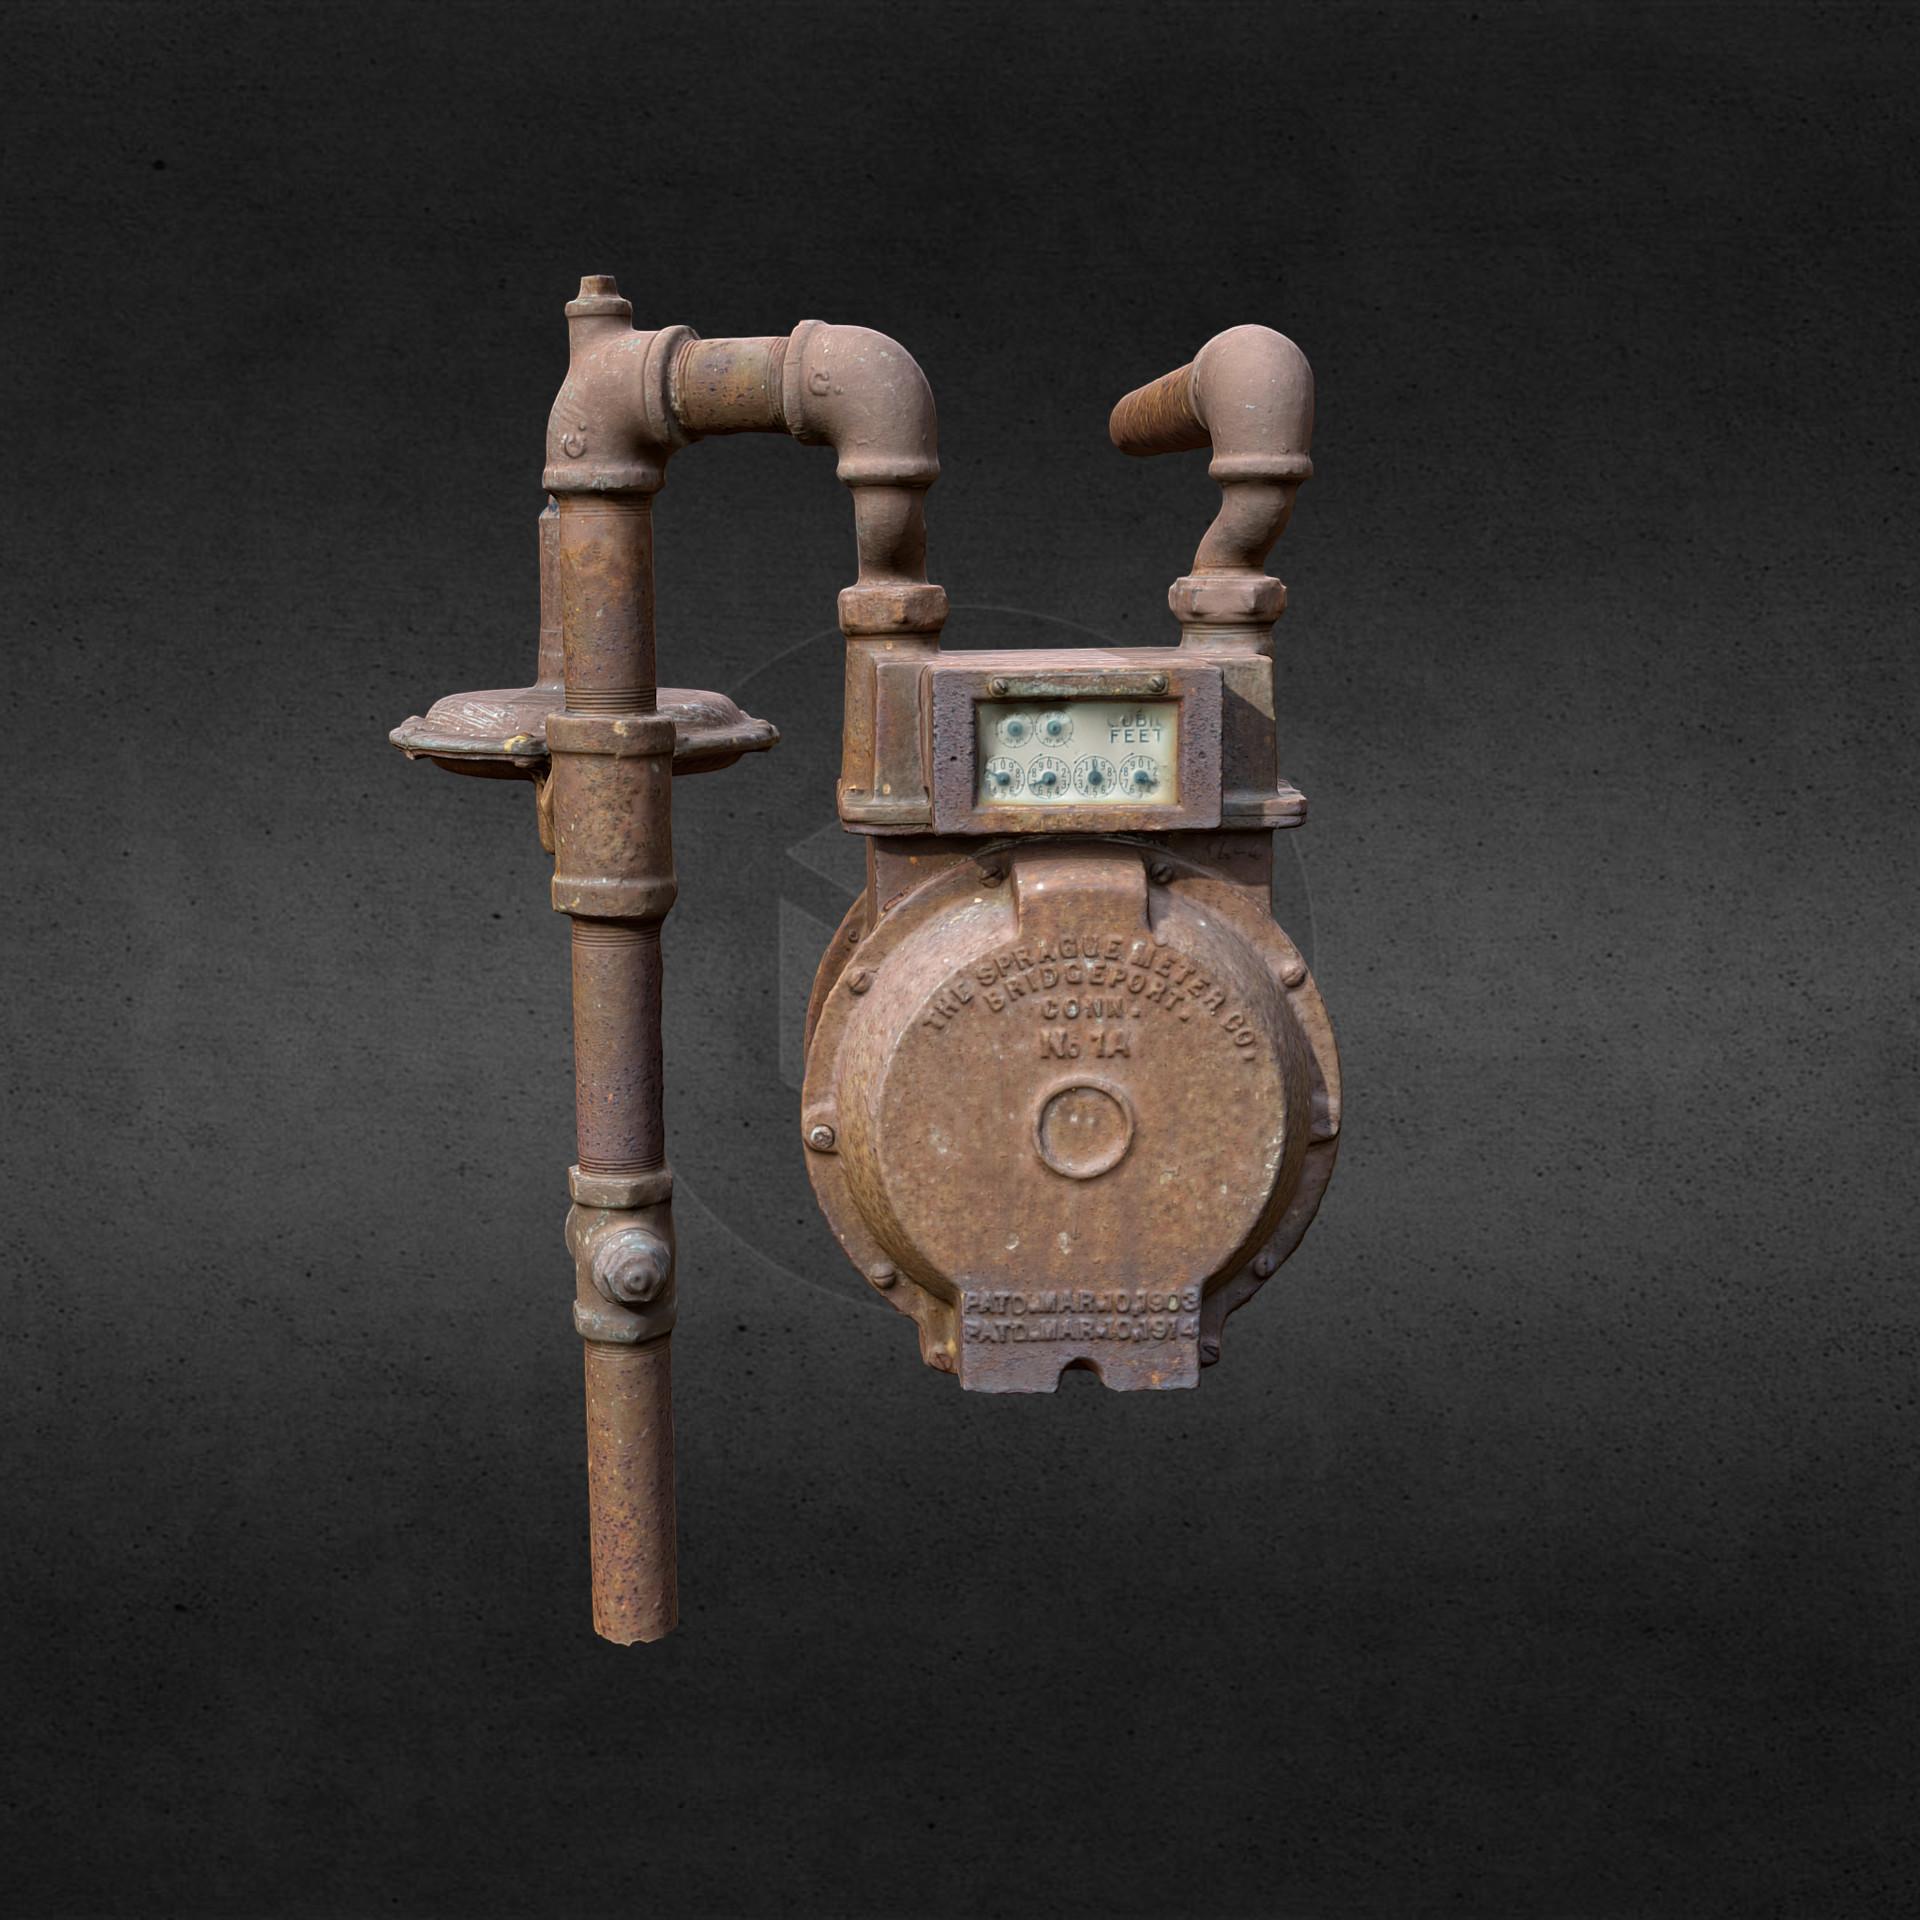 Andre bond gas meter 1